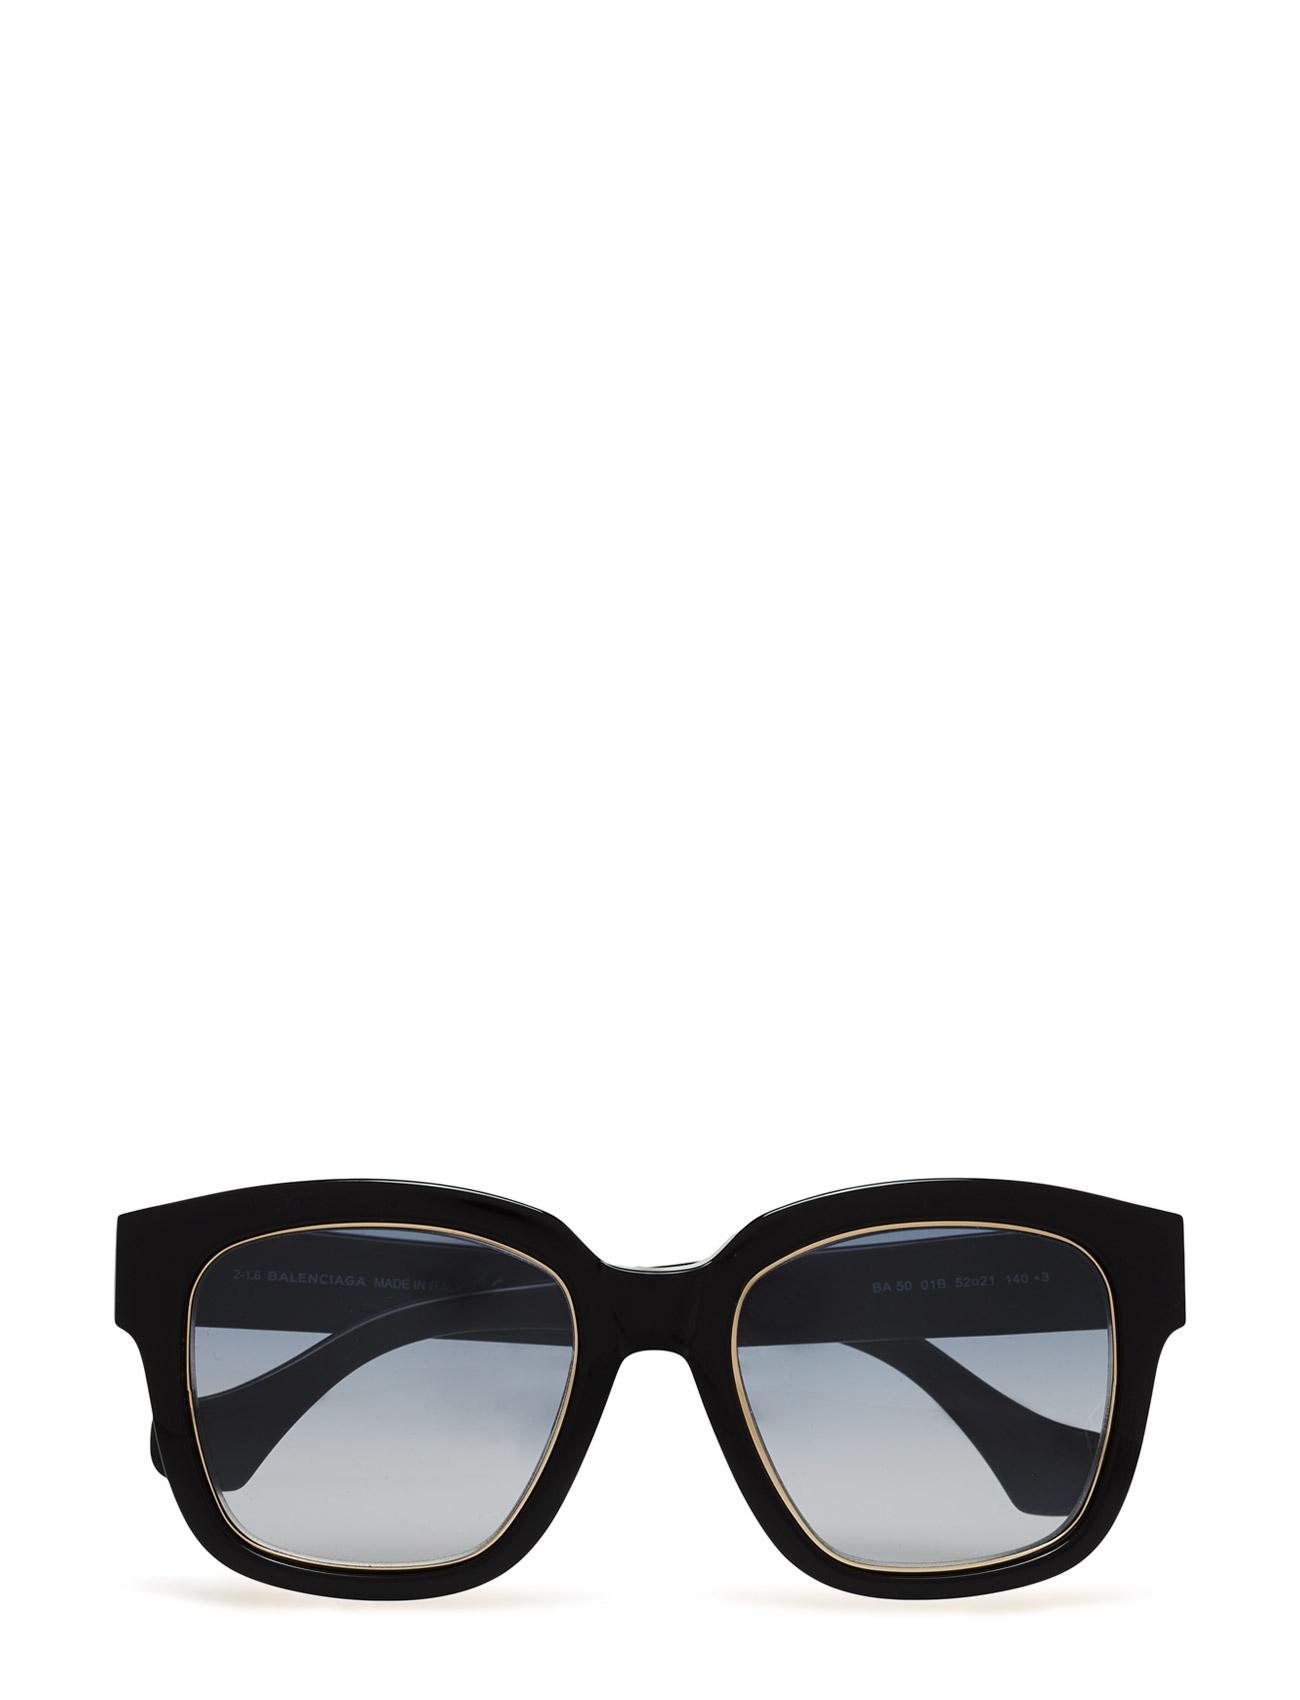 Ba0050 BALENCIAGA Sunglasses Solbriller til Damer i